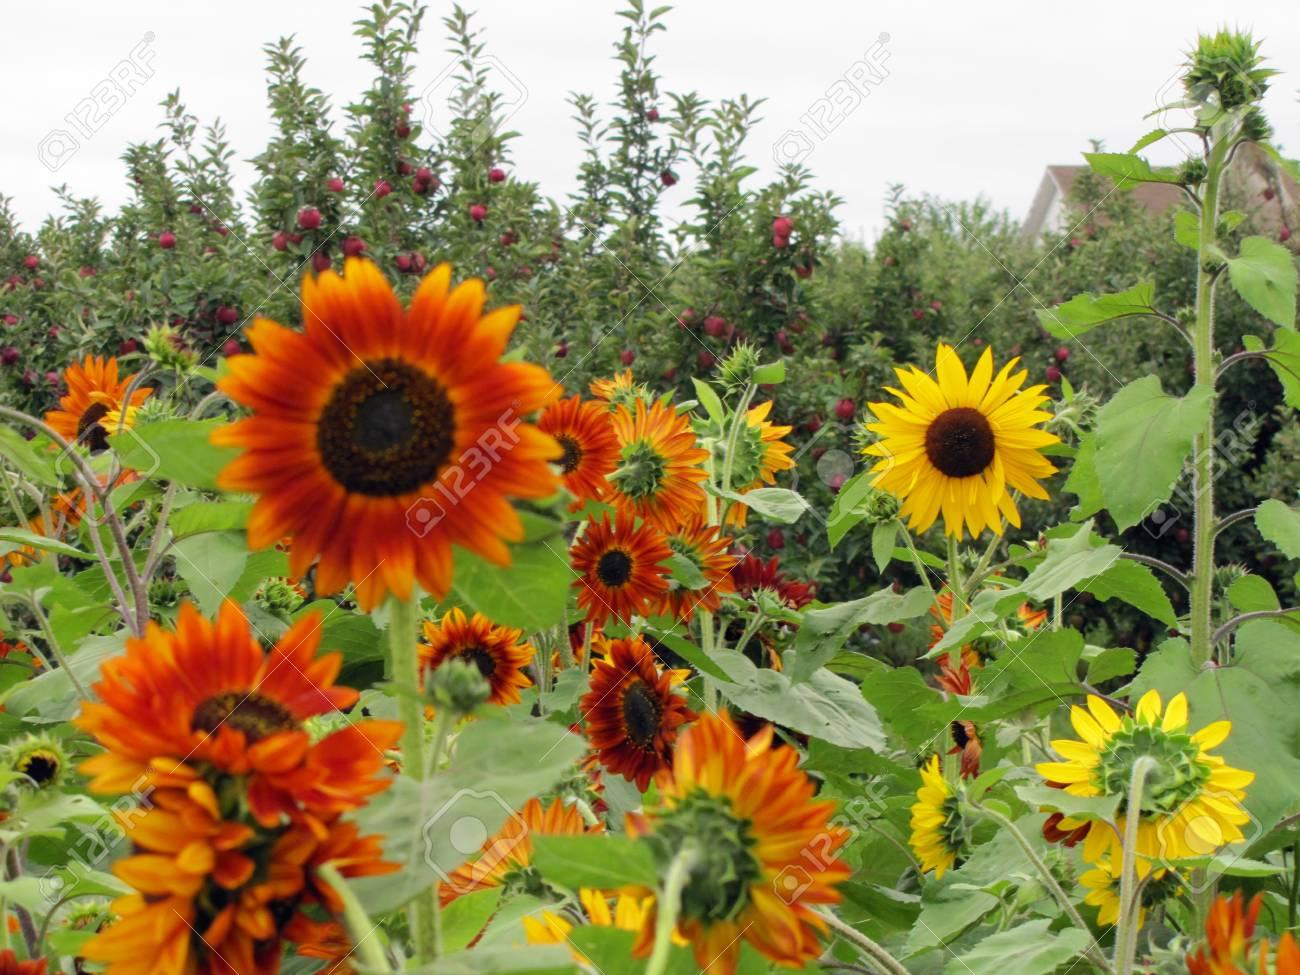 Sunflower patch - 34435259